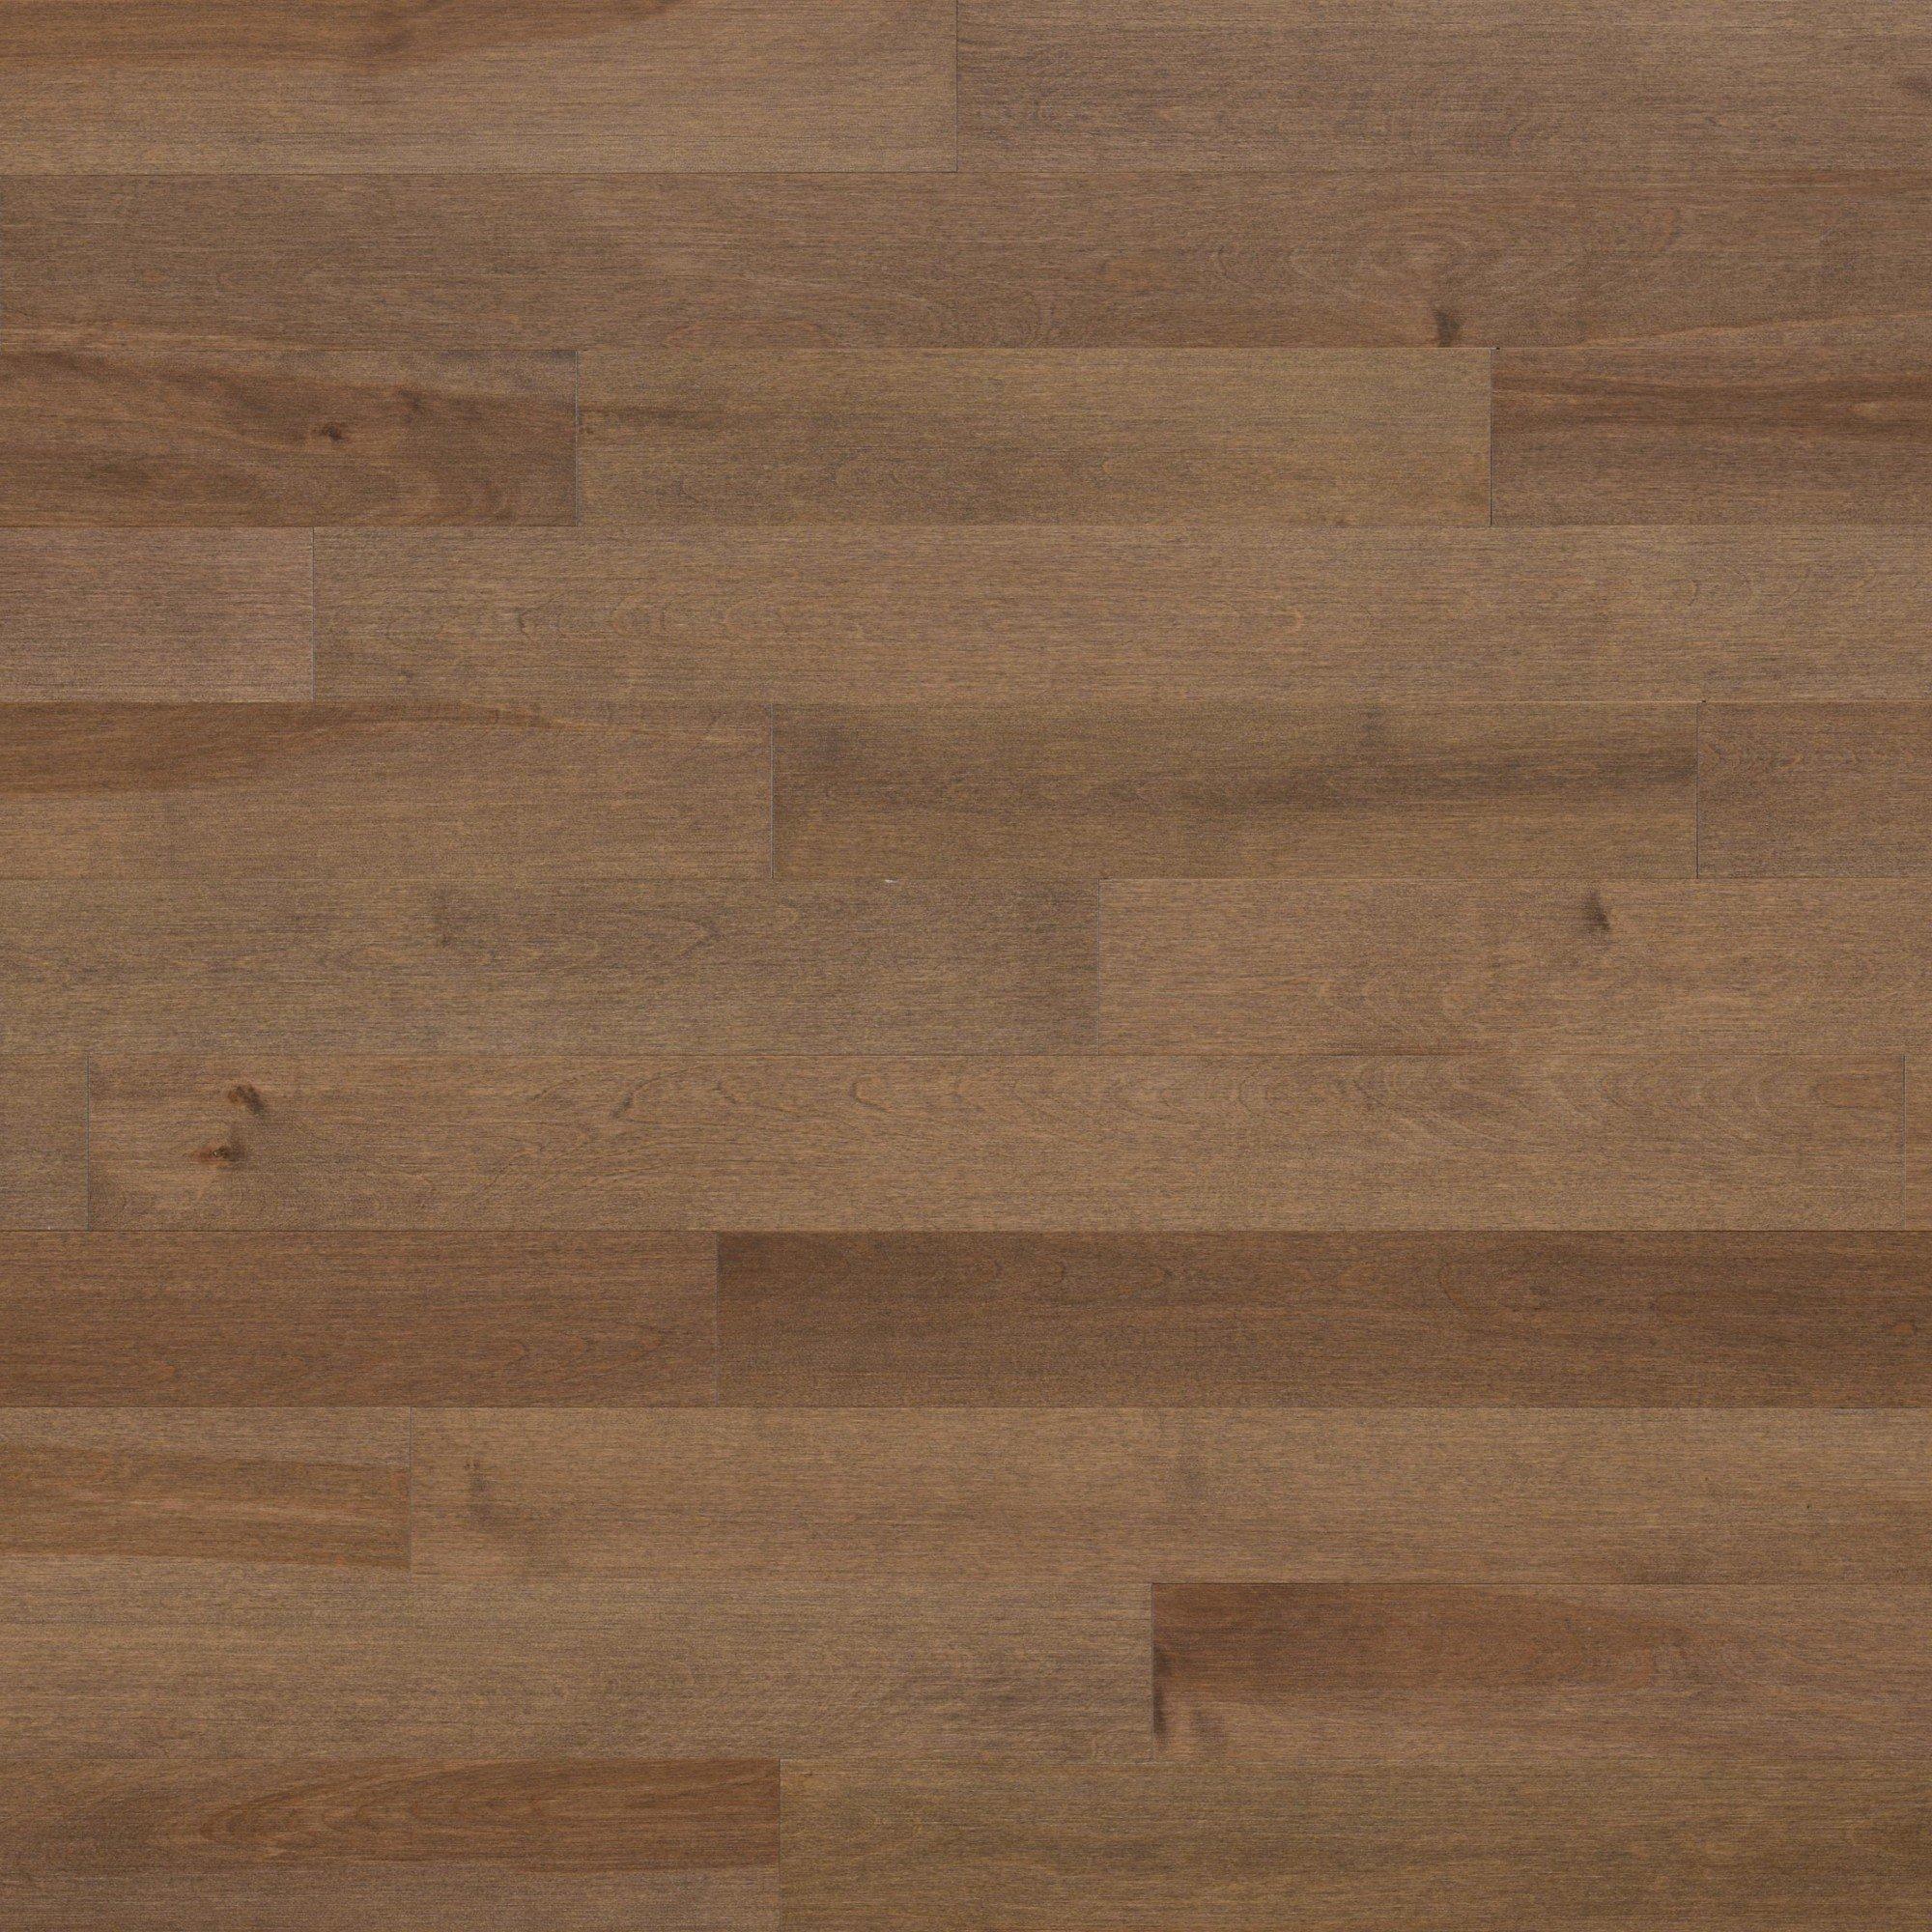 Merisier Tampa Exclusive Engravé - Image plancher